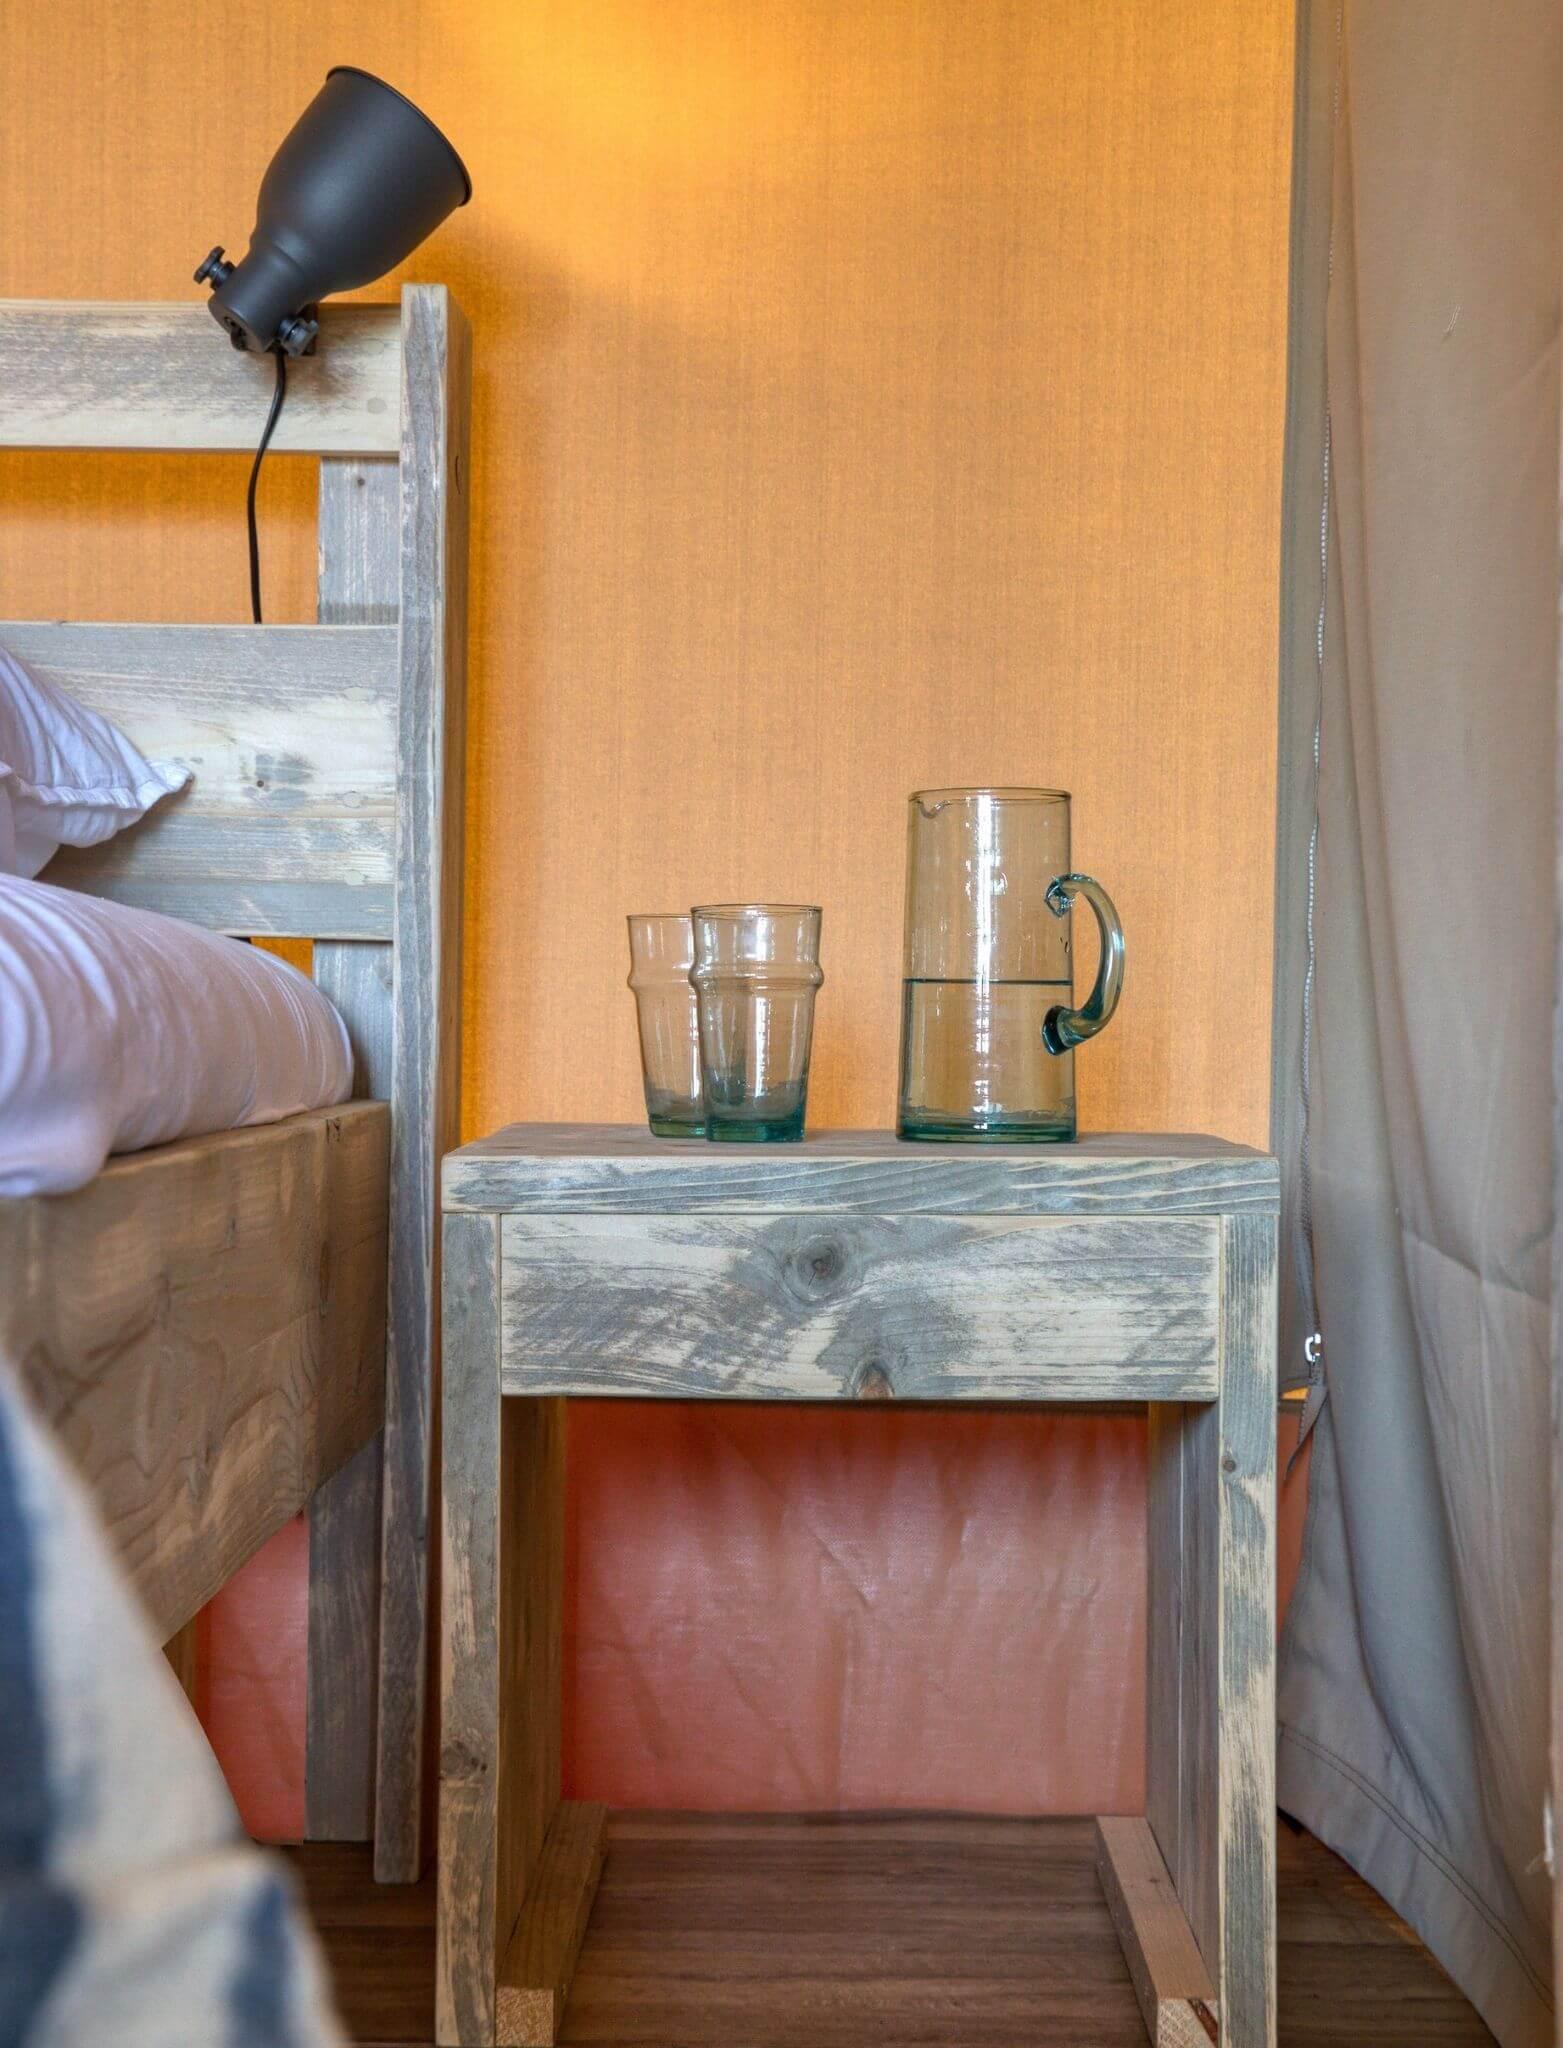 YALA_interior_Raw_bedside_table_water_glass